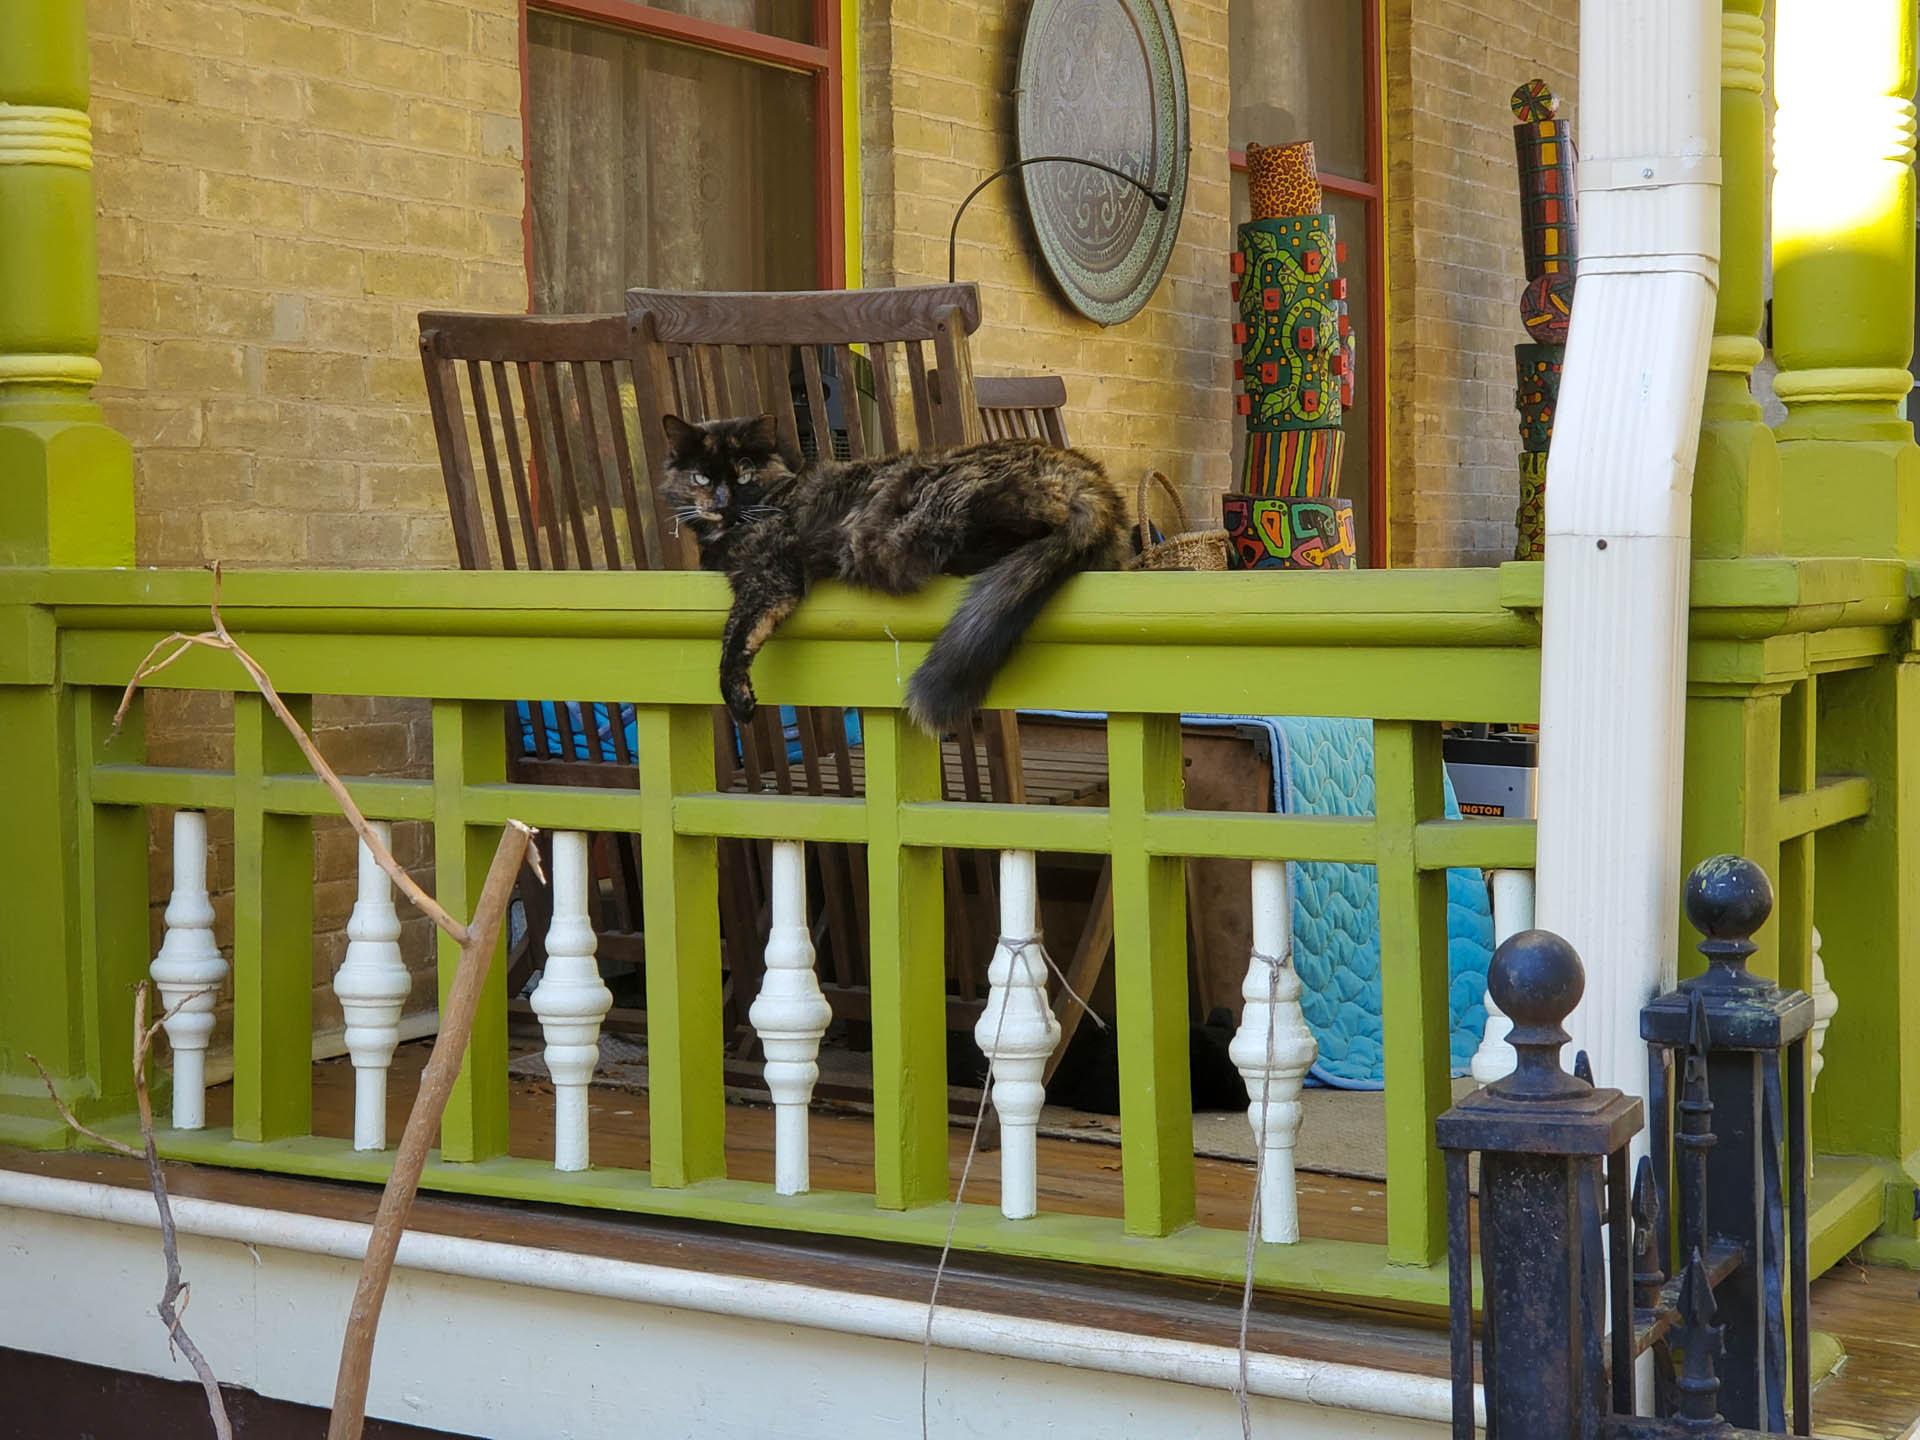 cat on porch railing